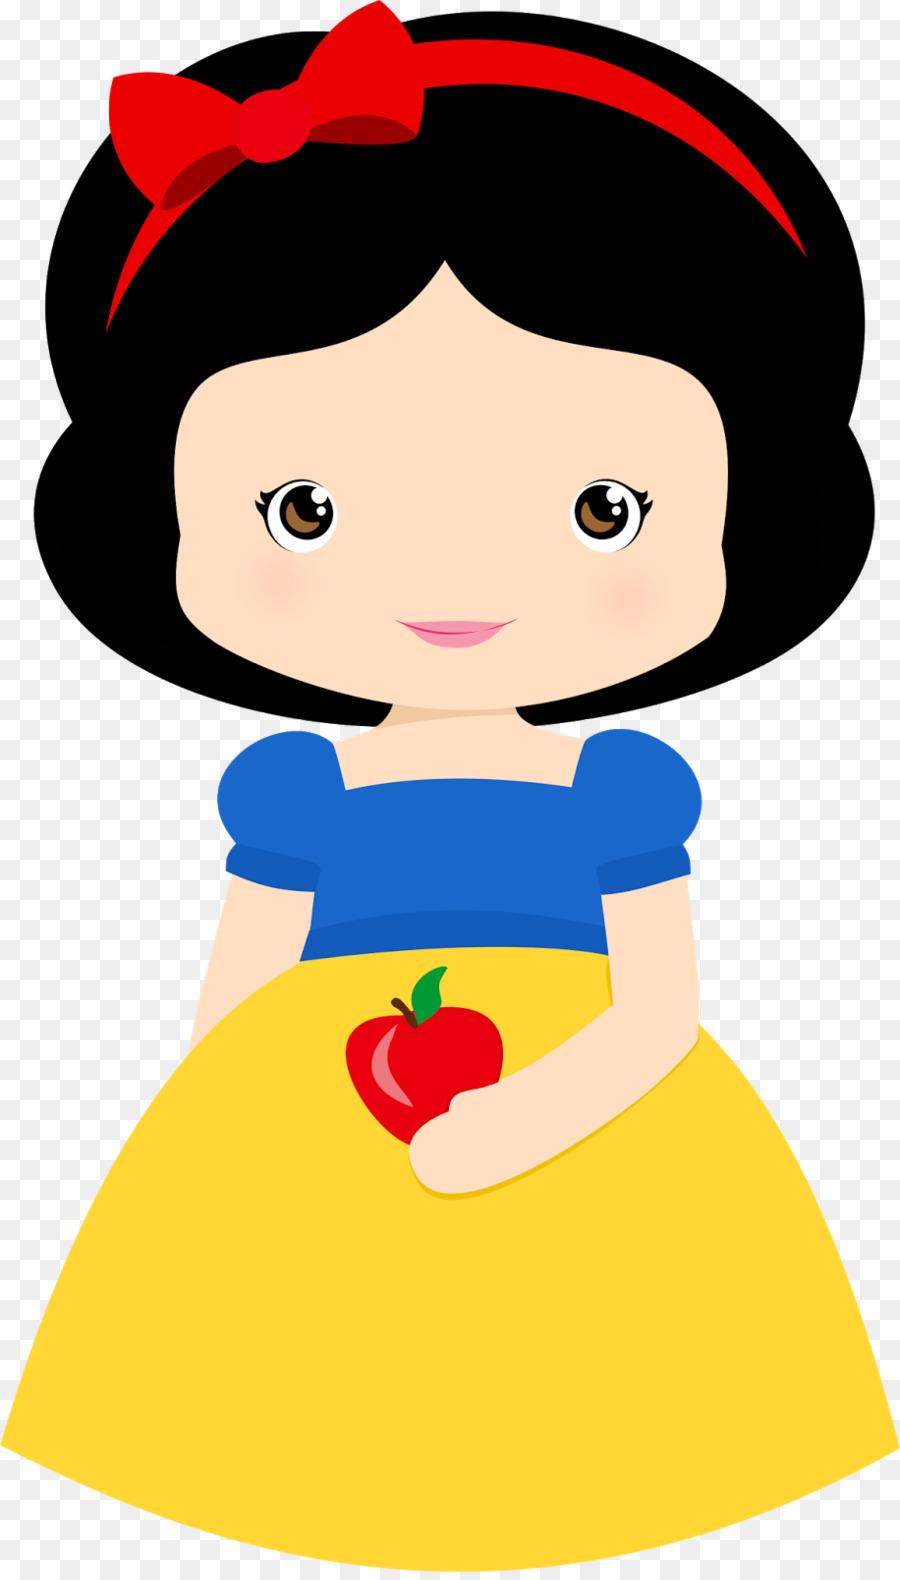 900x1580 Snow White Sneezy Disney Princess Clip Art